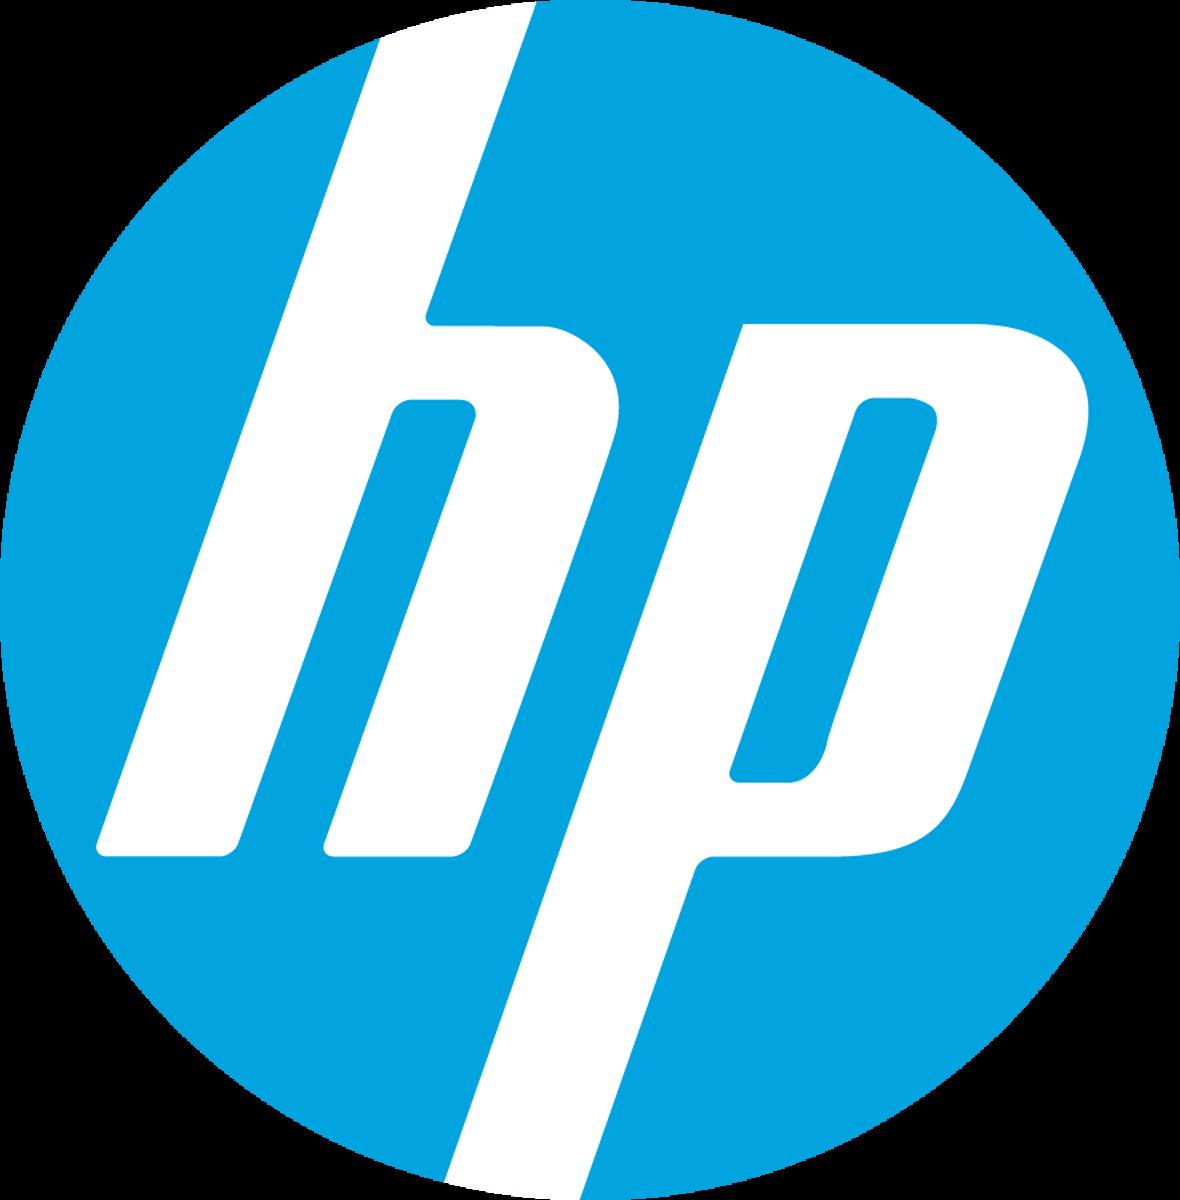 HP Omen 15T Gaming Laptop: Win Pro, 4k, RTX 2070, i7-9750H, 256GB SSD 16g ram $1312 after rebate +free omen headset